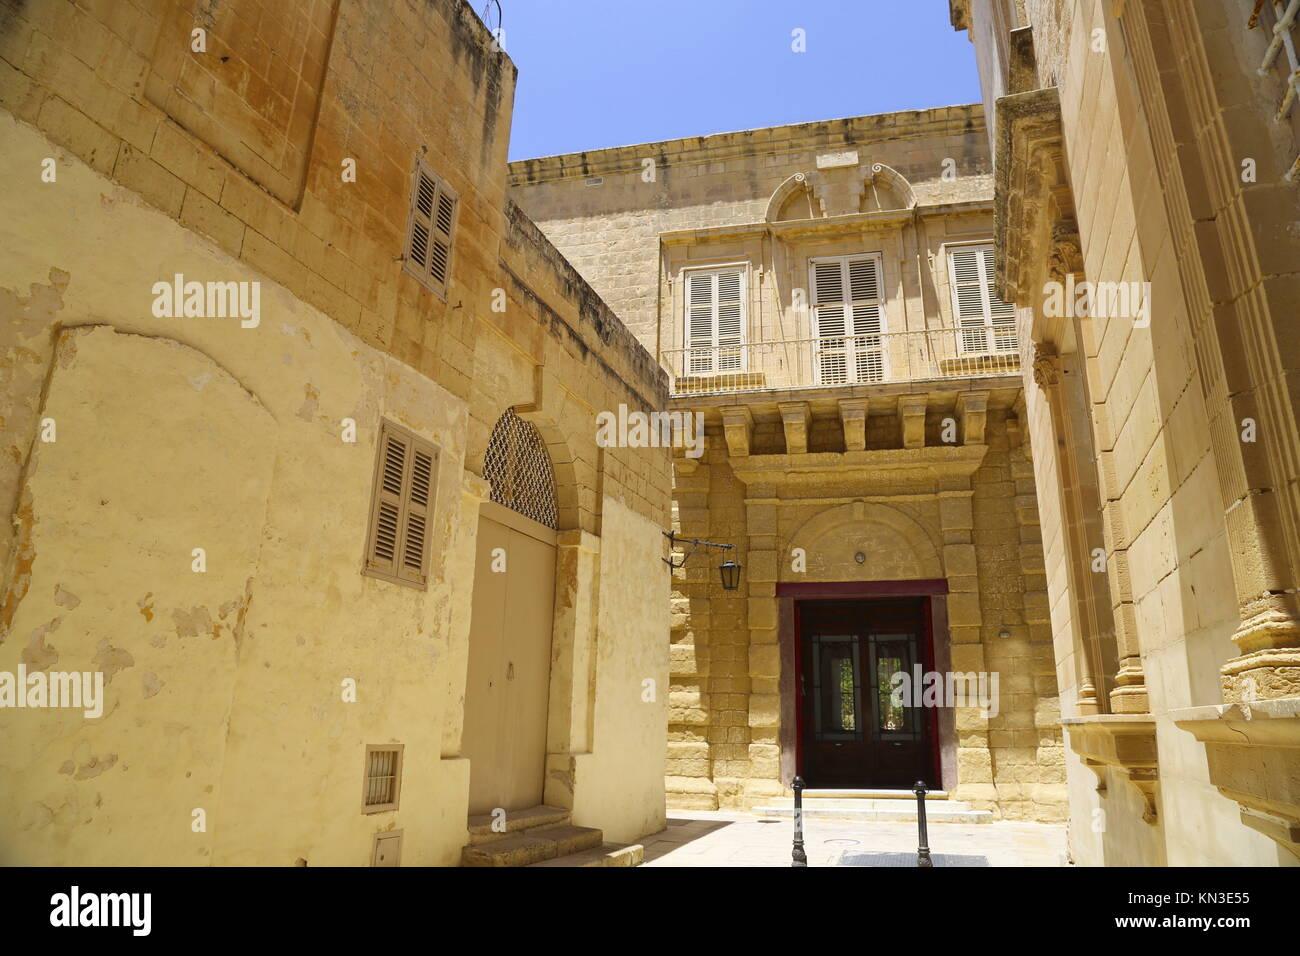 L'architecture ancienne à Mdina, Malte, l'Europe du sud. Photo Stock